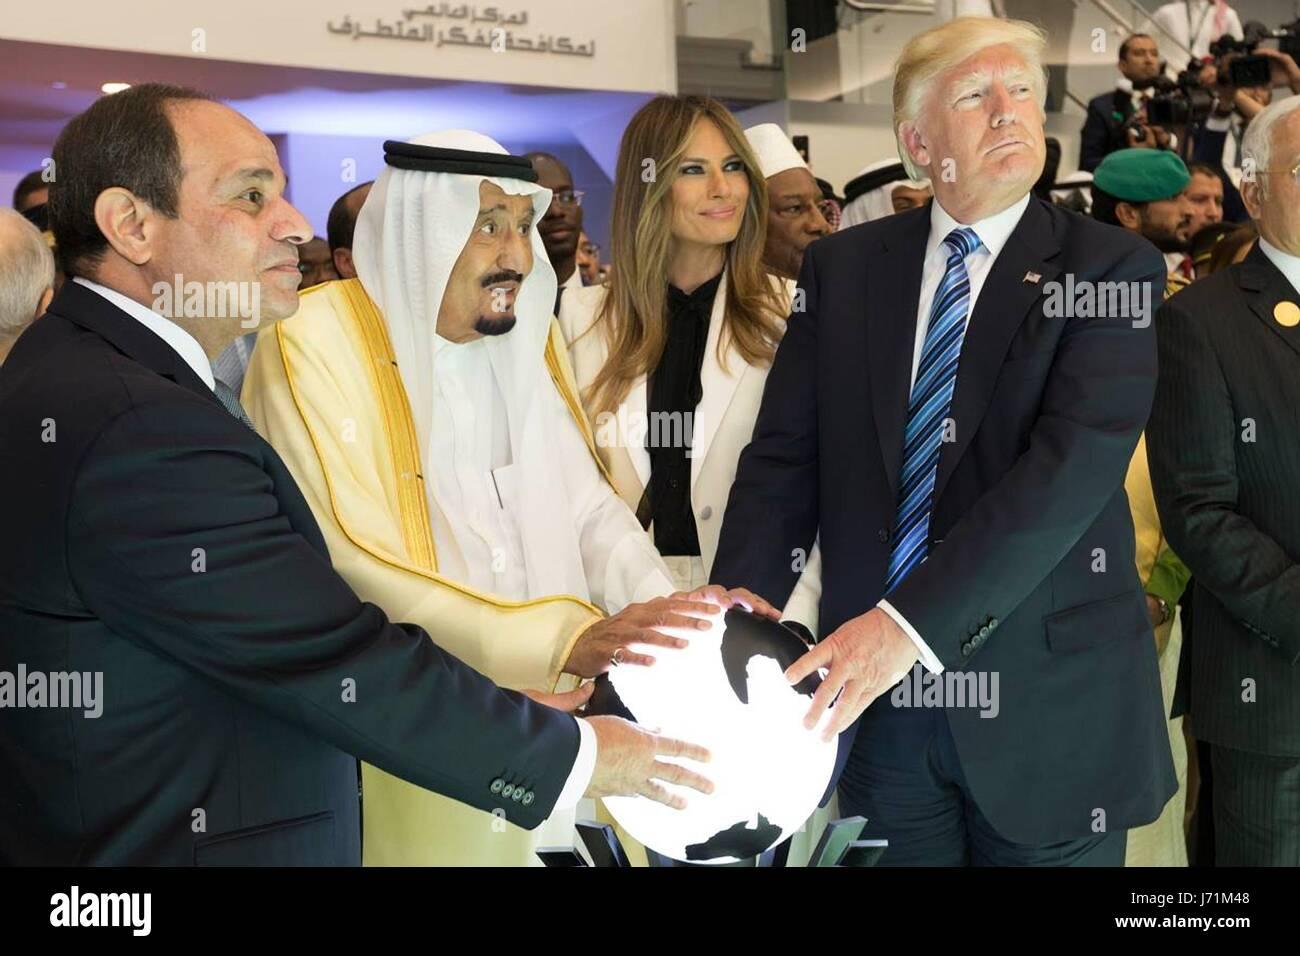 U.S. President Donald Trump and First Lady Melania Trump join Saudi King Salman bin Abdulaziz Al Saud and Egyptian - Stock Image